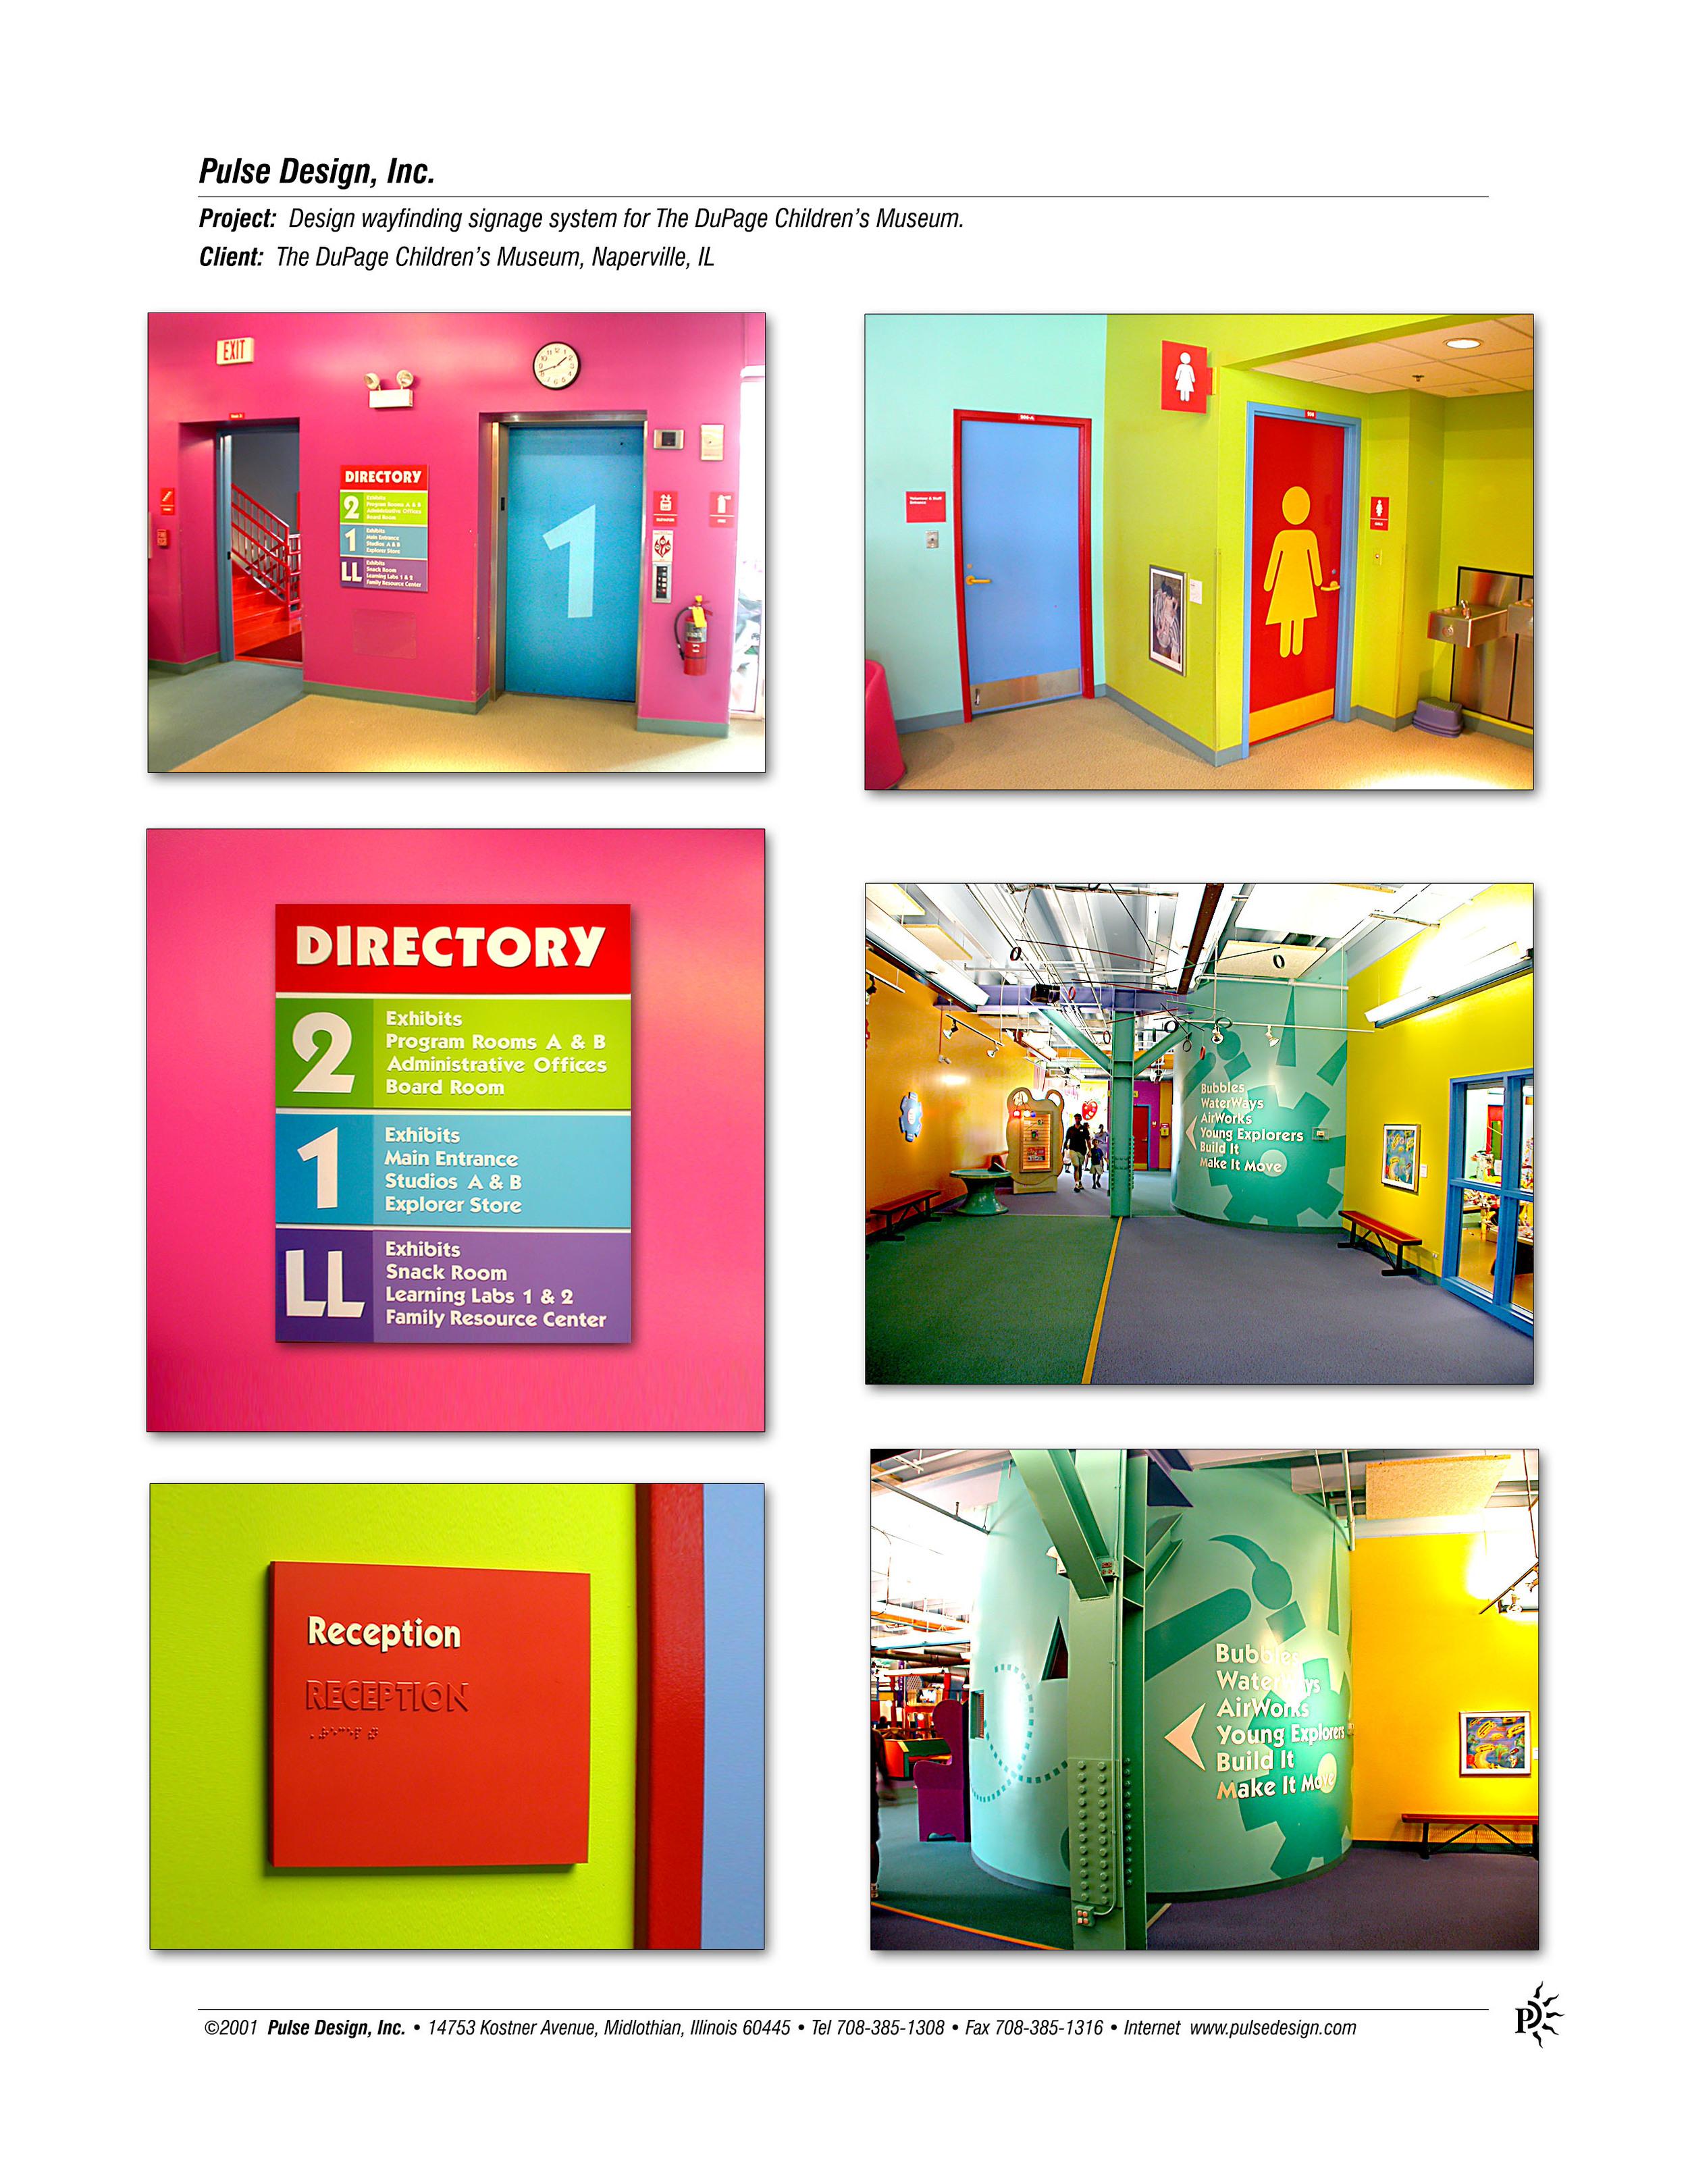 DCM-Wayfining-Pulse-Design-Inc.jpg